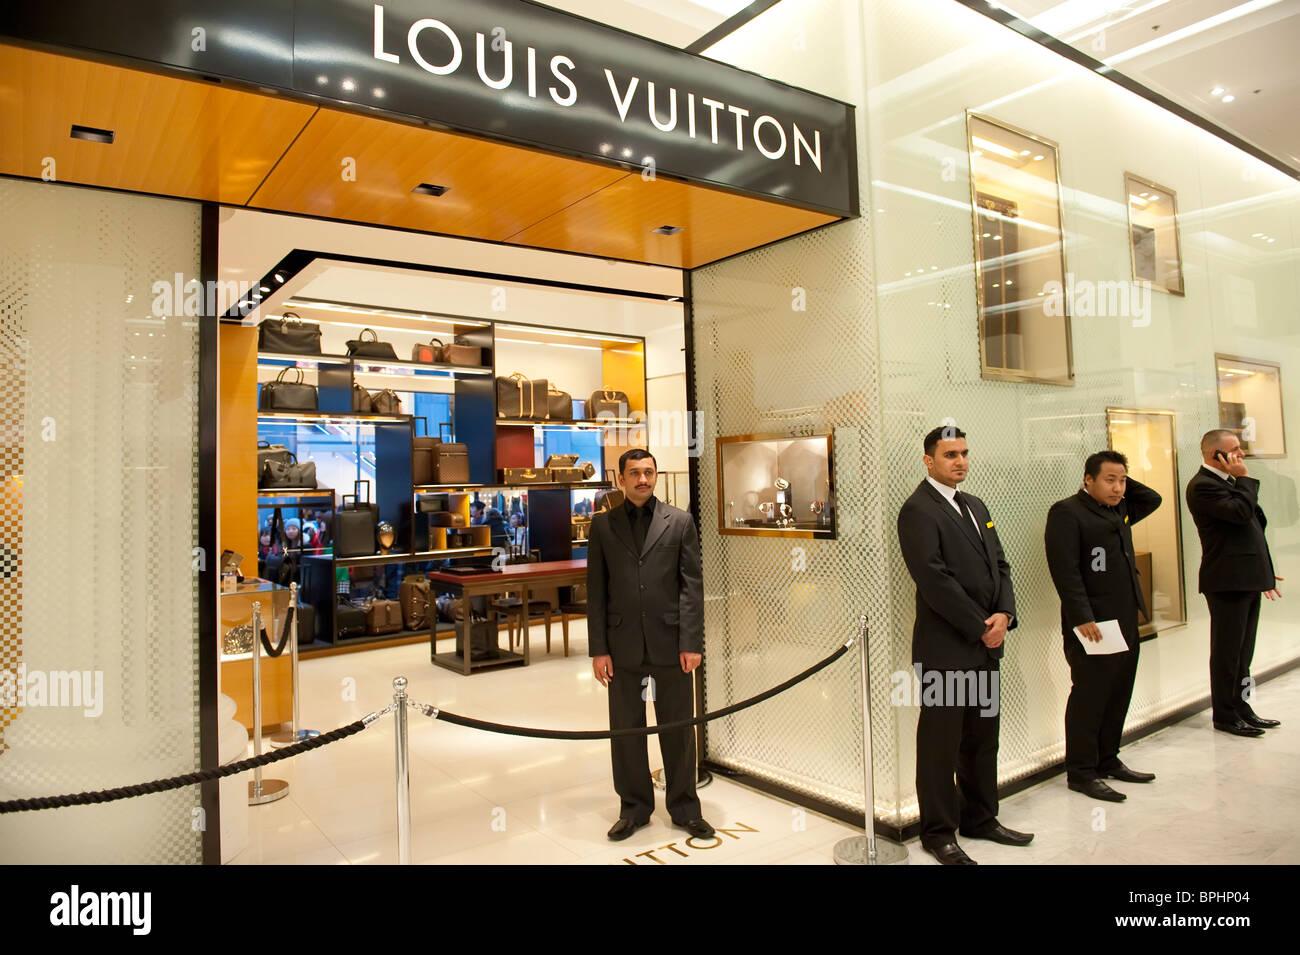 Louis Vuitton Boutique Stockfotos Louis Vuitton Boutique Bilder